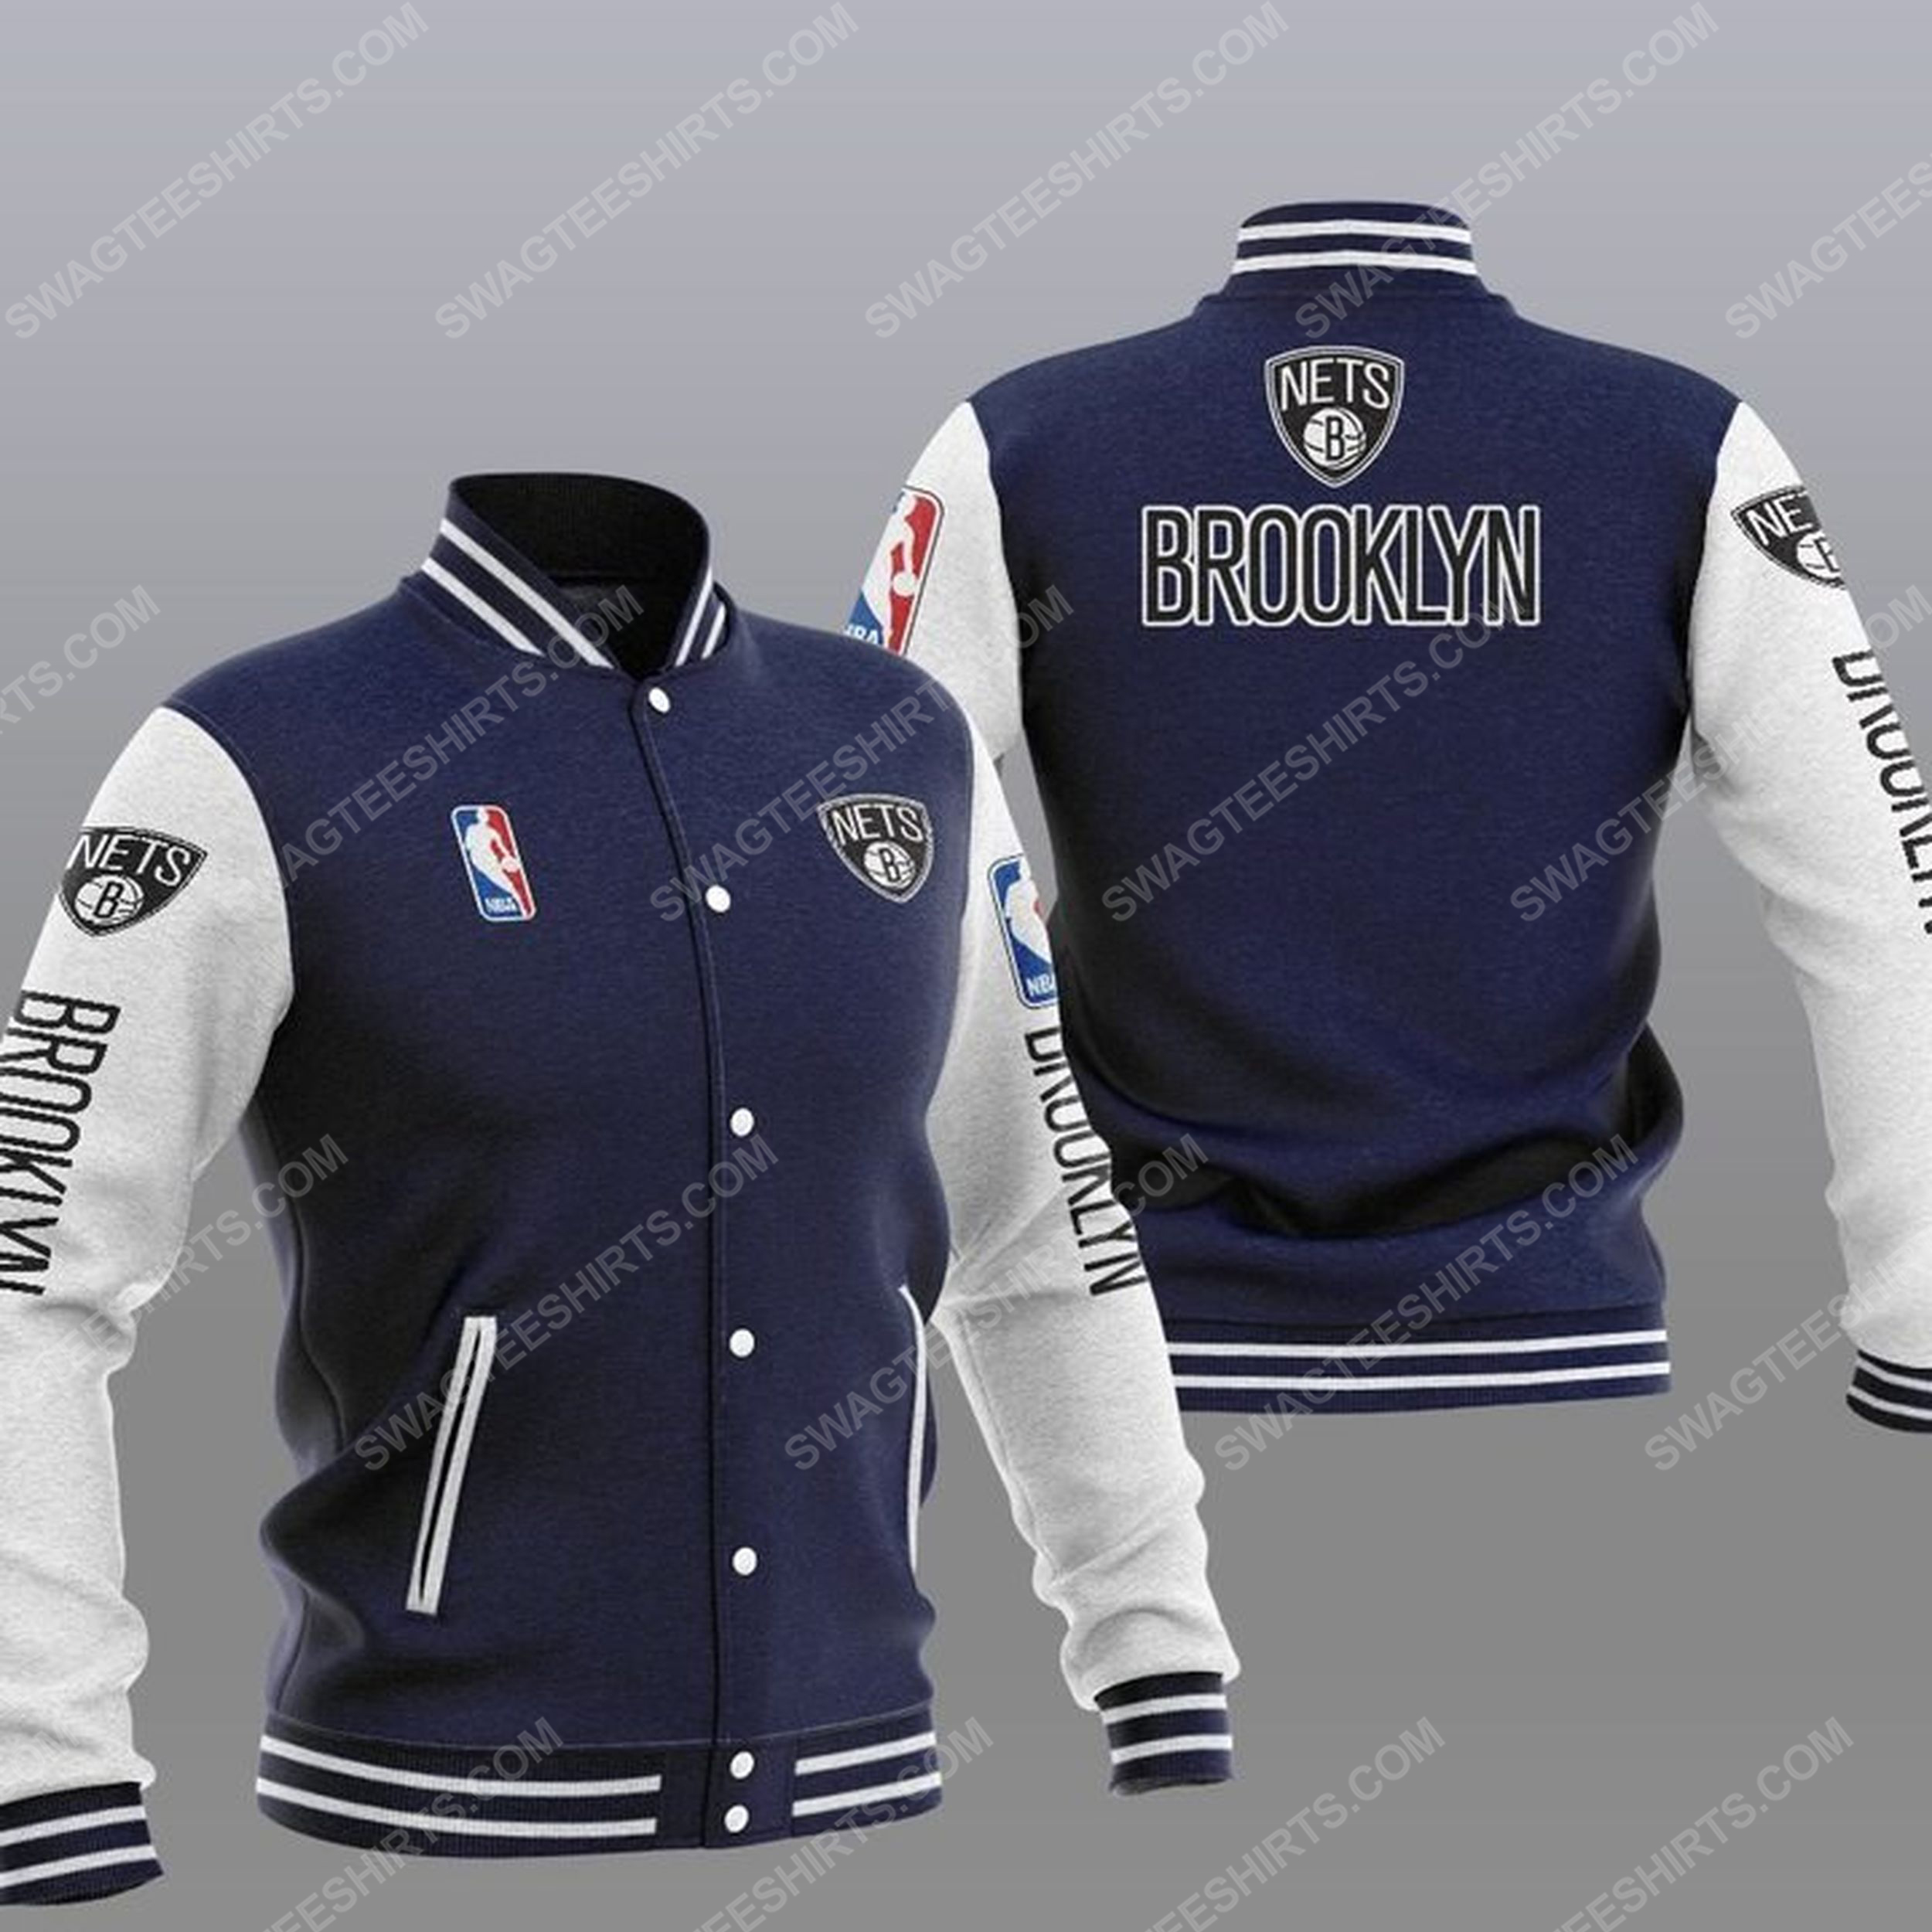 The brooklyn nets nba all over print baseball jacket - navy 1